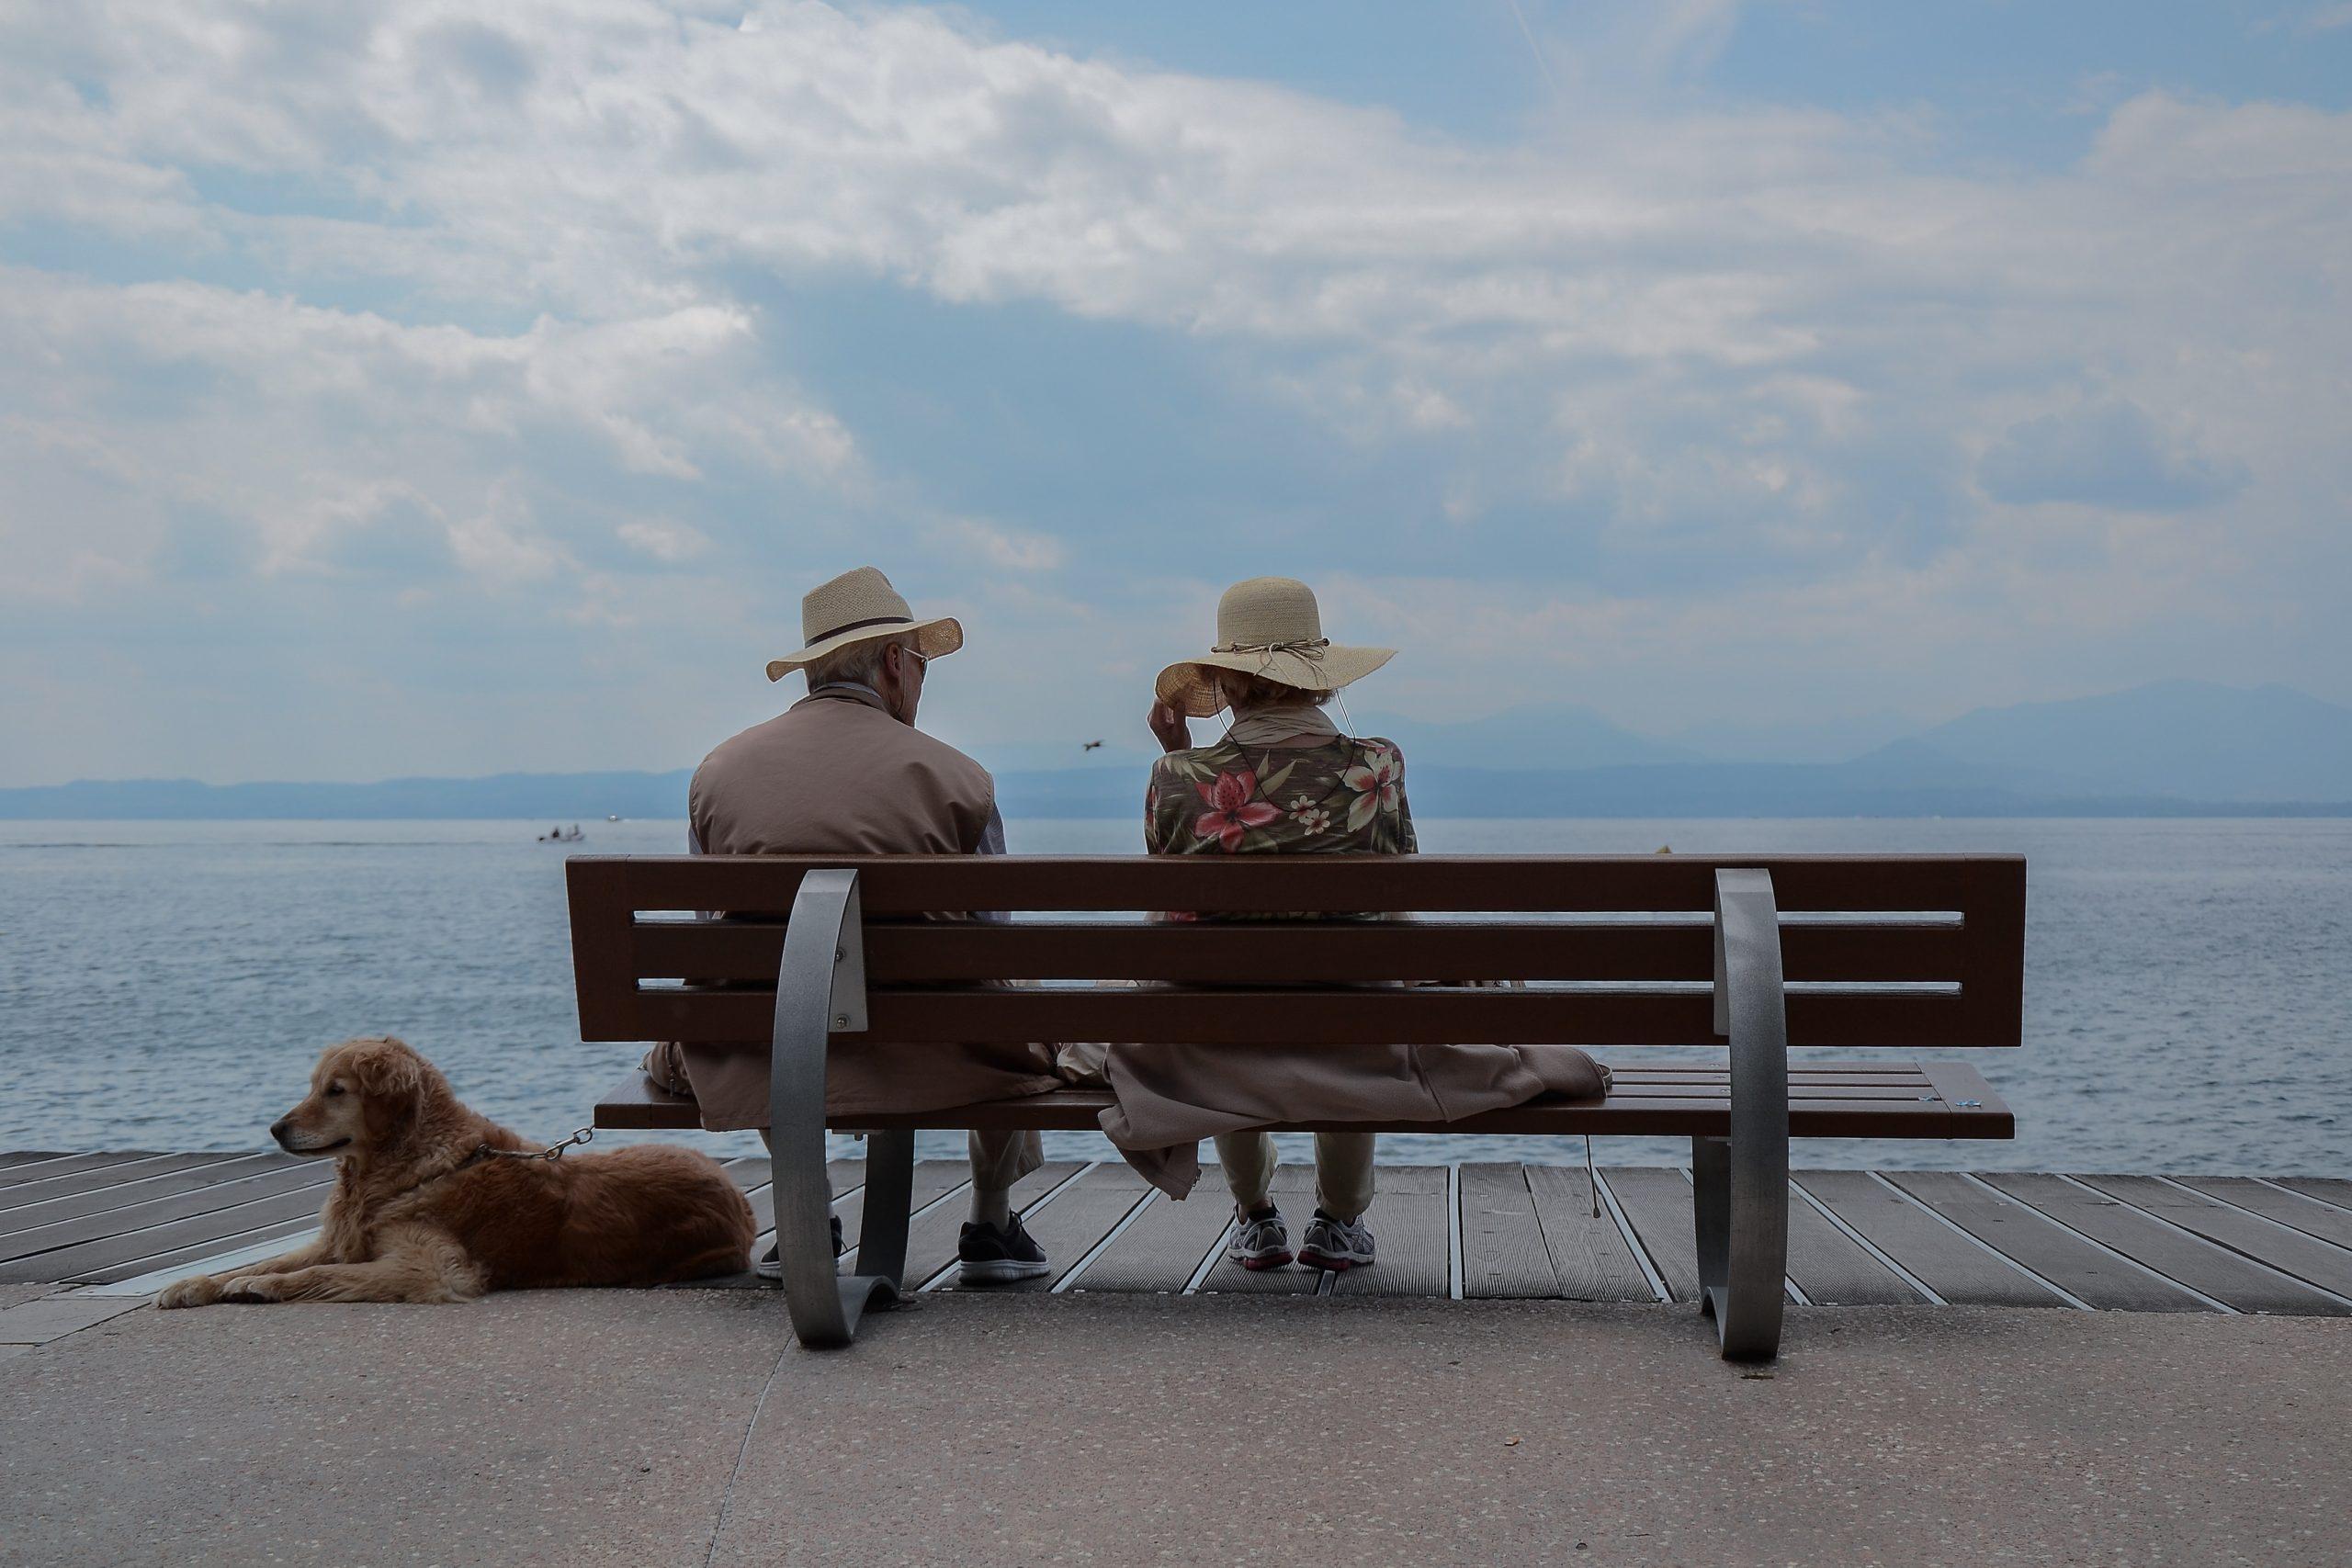 Minimum Pension Withdrawals Cut for 2020-21